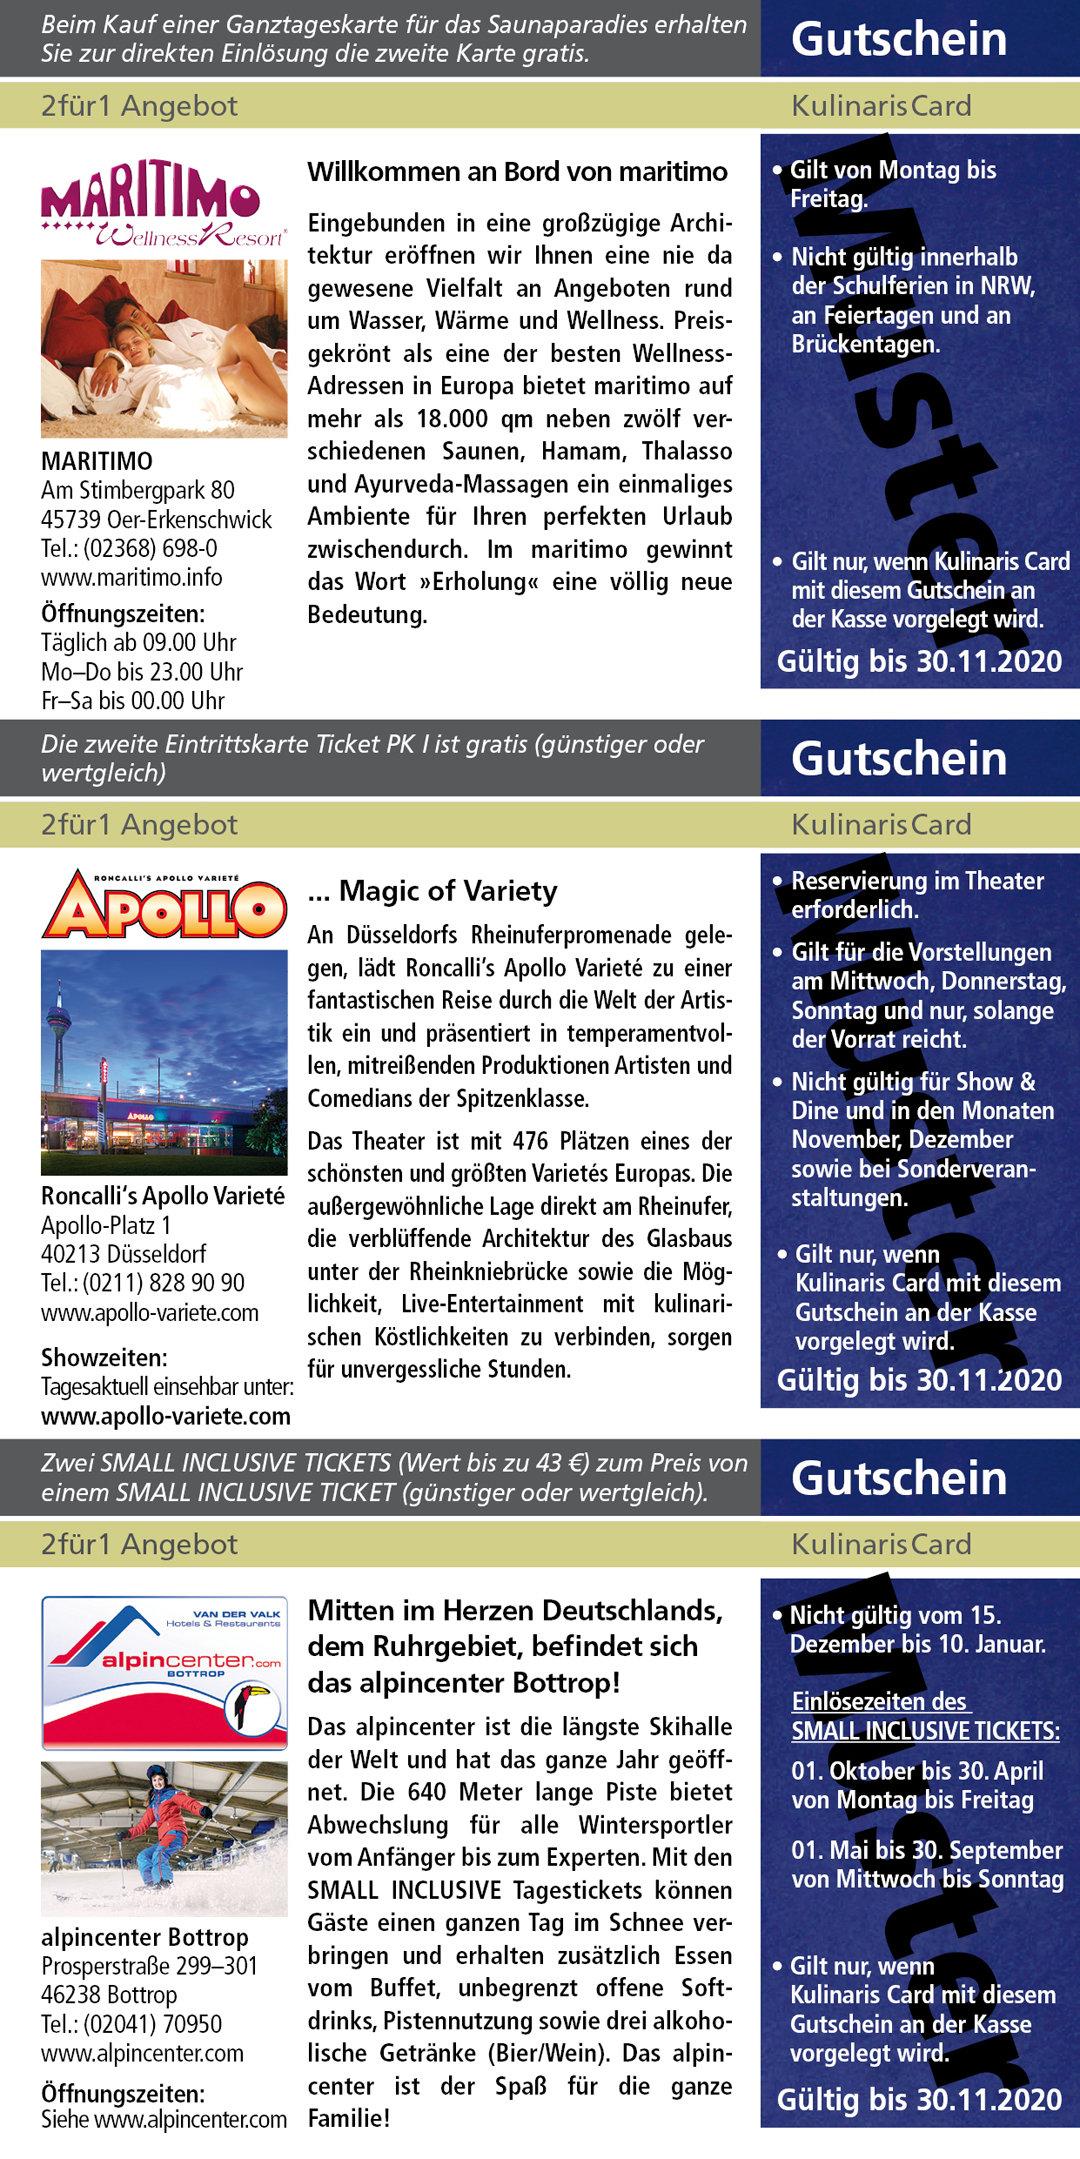 MARITIMO www.maritimo.info Roncalli's Apollo Varieté www.apollo-variete.com alpincenter Bottrop www.alpincenter.com